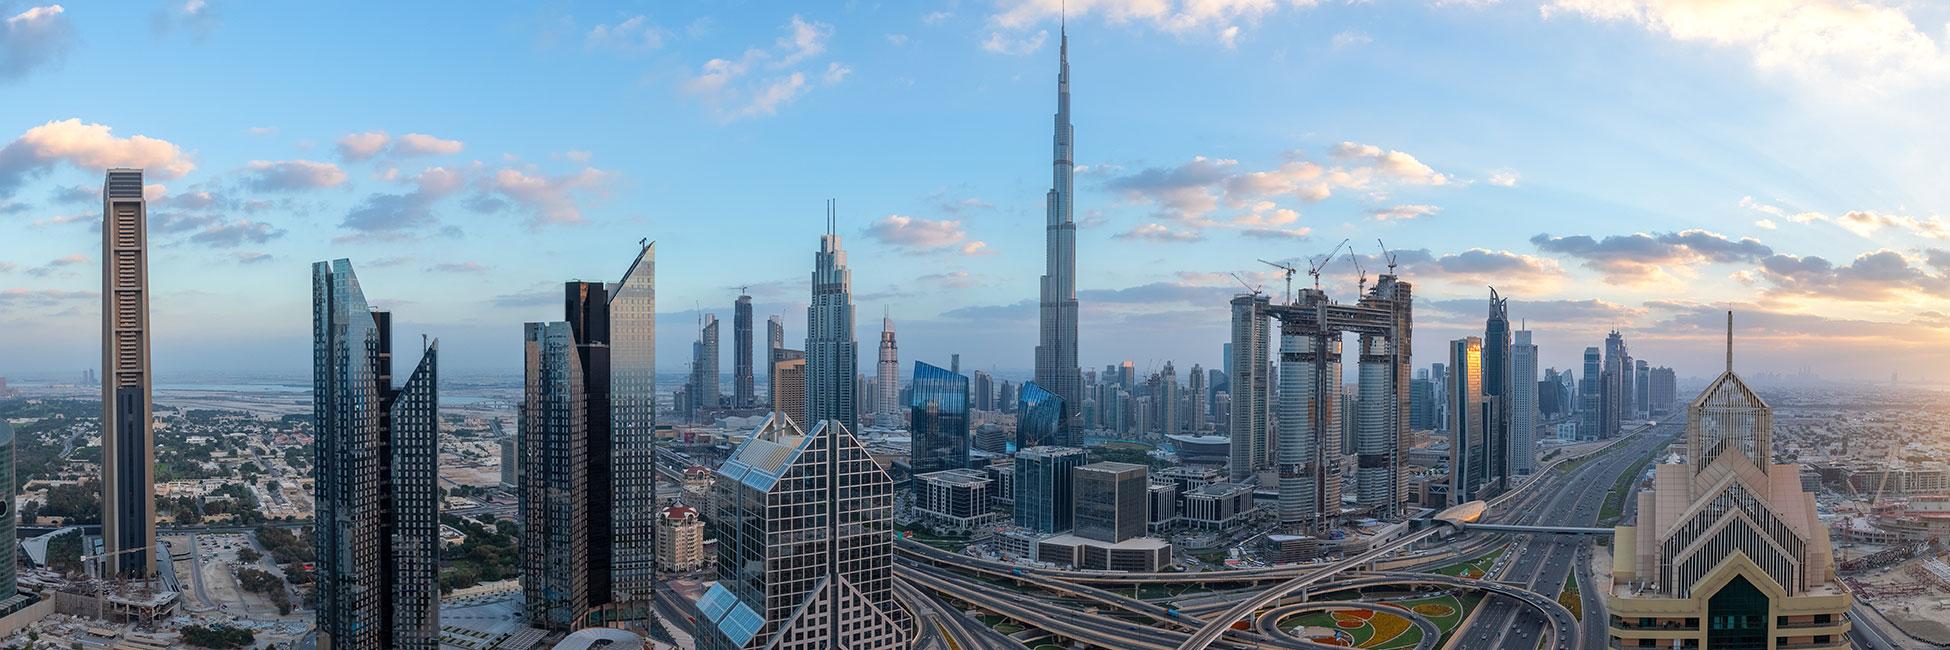 Dubai - Bain & Company